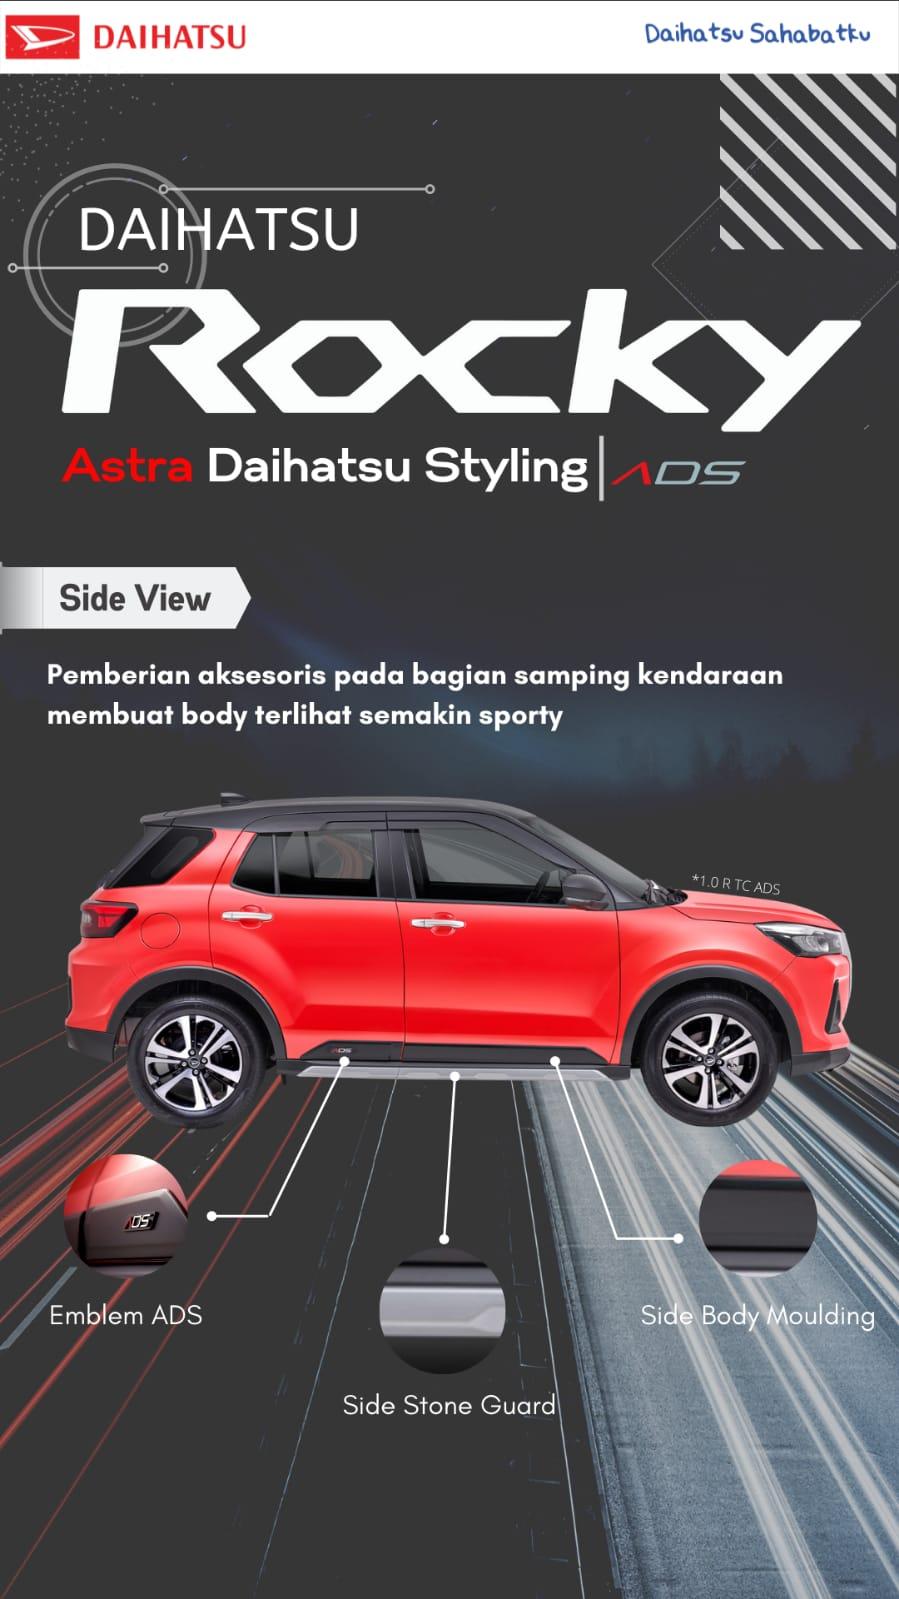 Promo-Daihatsu-Tulungagung-2021-Rocky-1